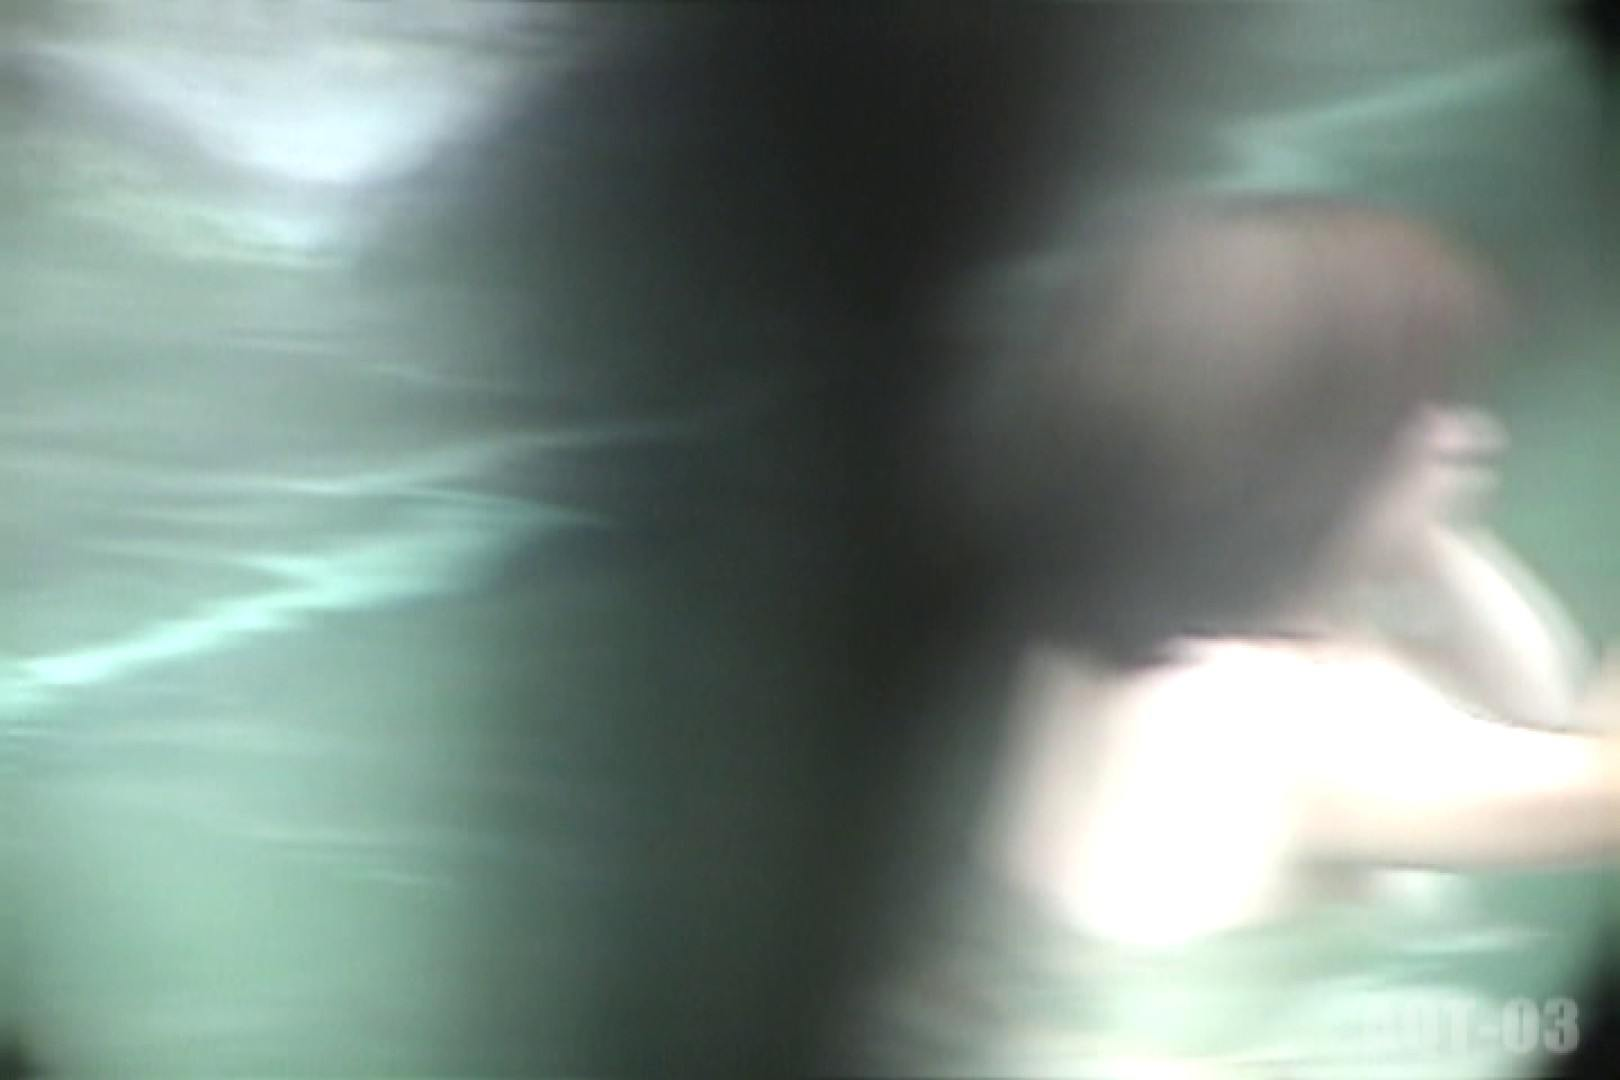 Aquaな露天風呂Vol.731 露天風呂編   盗撮シリーズ  76PIX 17